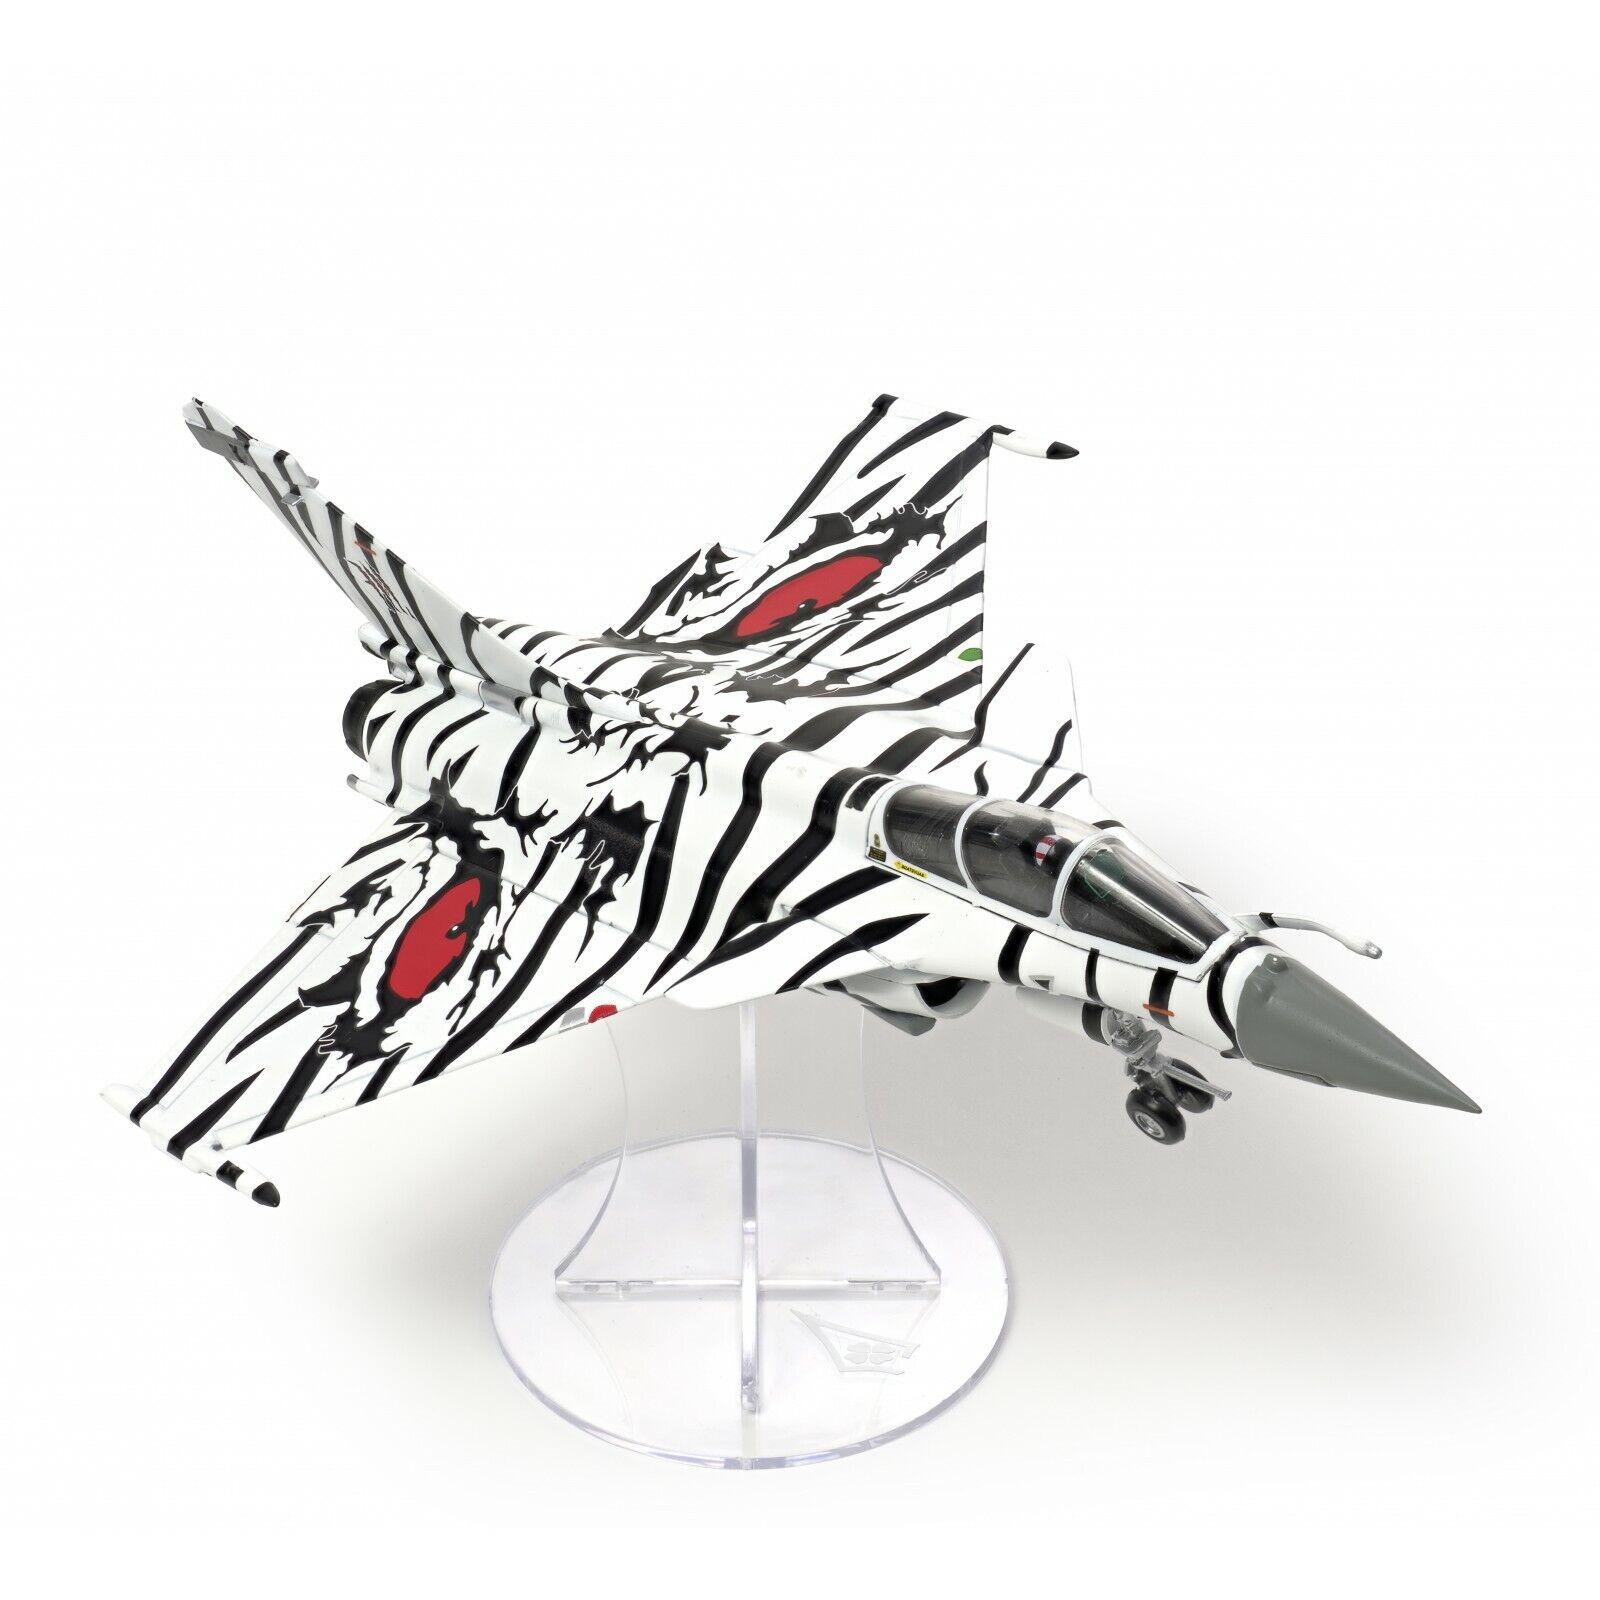 Avion Dassault Rafale M NATO Tiger Meet 2017 1 72 Neuf en boite miniature